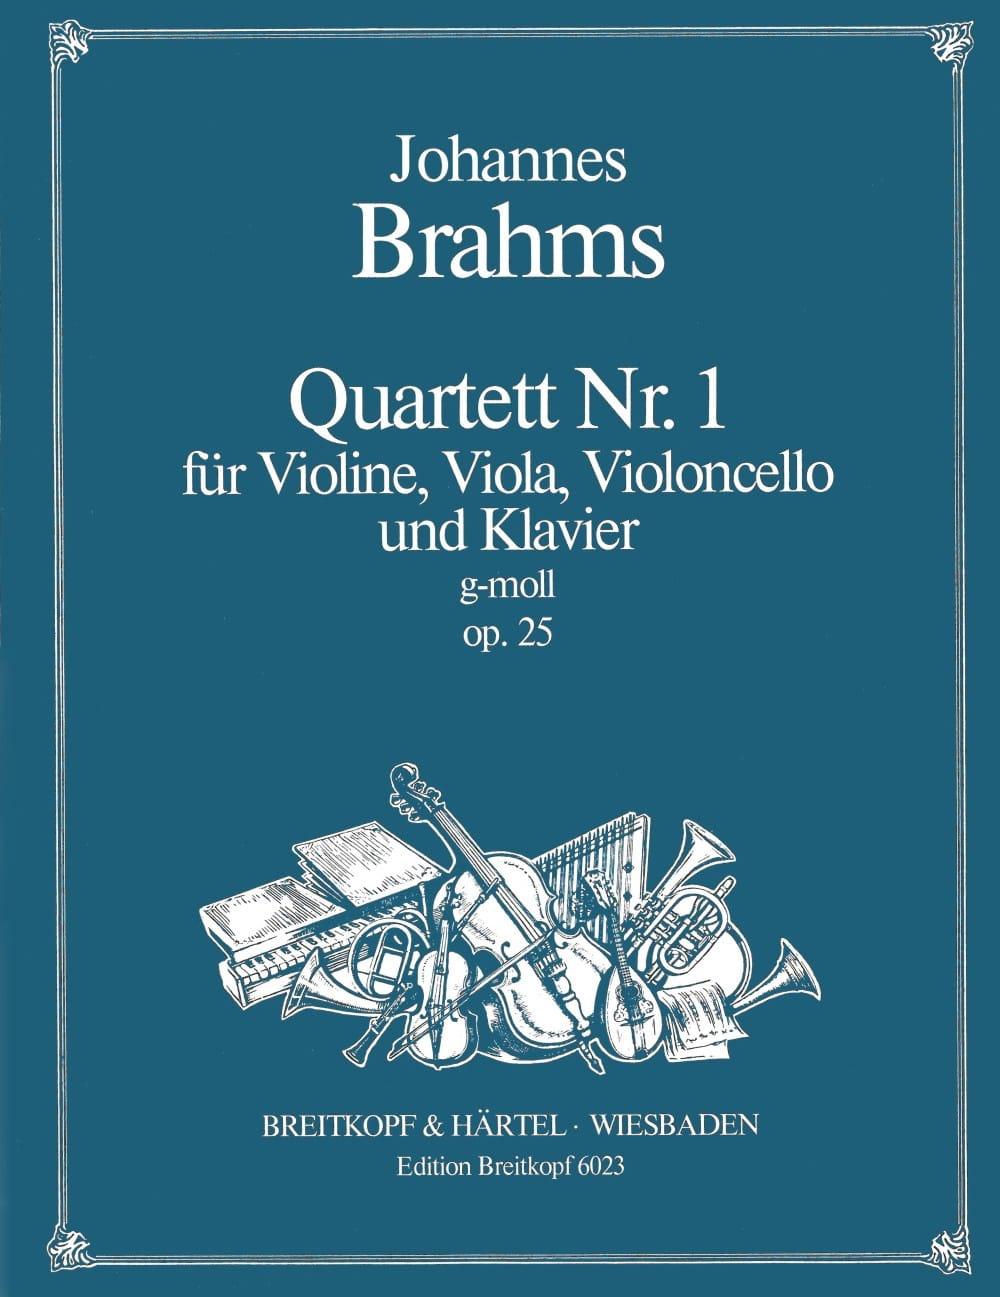 BRAHMS - Klavierquartett Nr. 1 g-moll op. 25 - Stimmen - Partition - di-arezzo.com